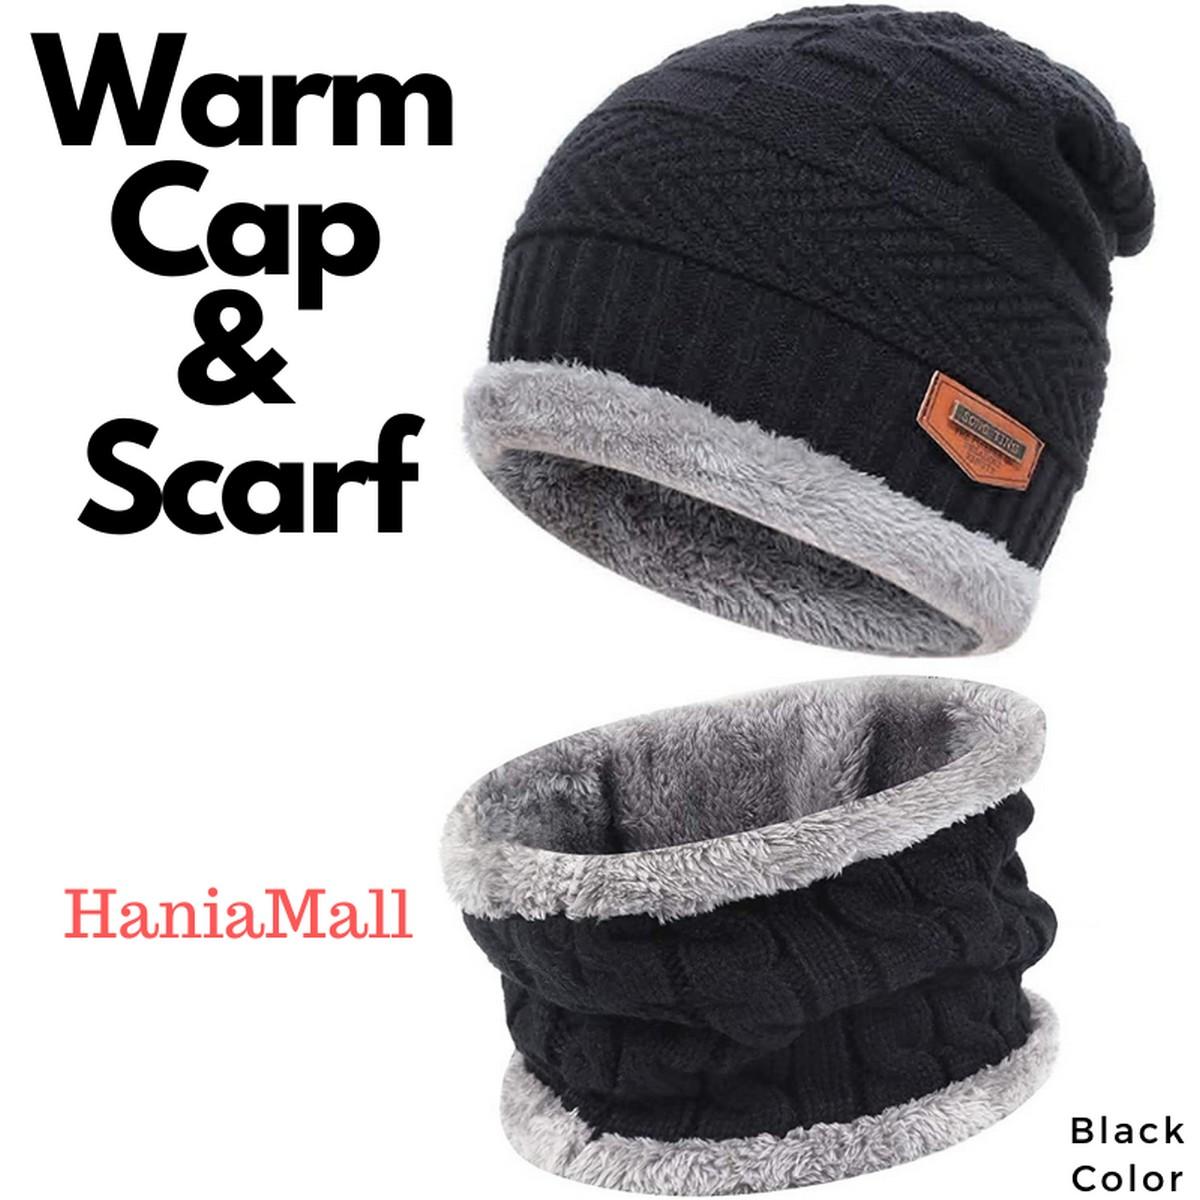 2 Piece Winter Elastic Knitting Thick Fleece Warm Woolen Beanie Cap Sport Hat & Neck Scarf Set for Unisex Men Women Multicolor Snow Proof